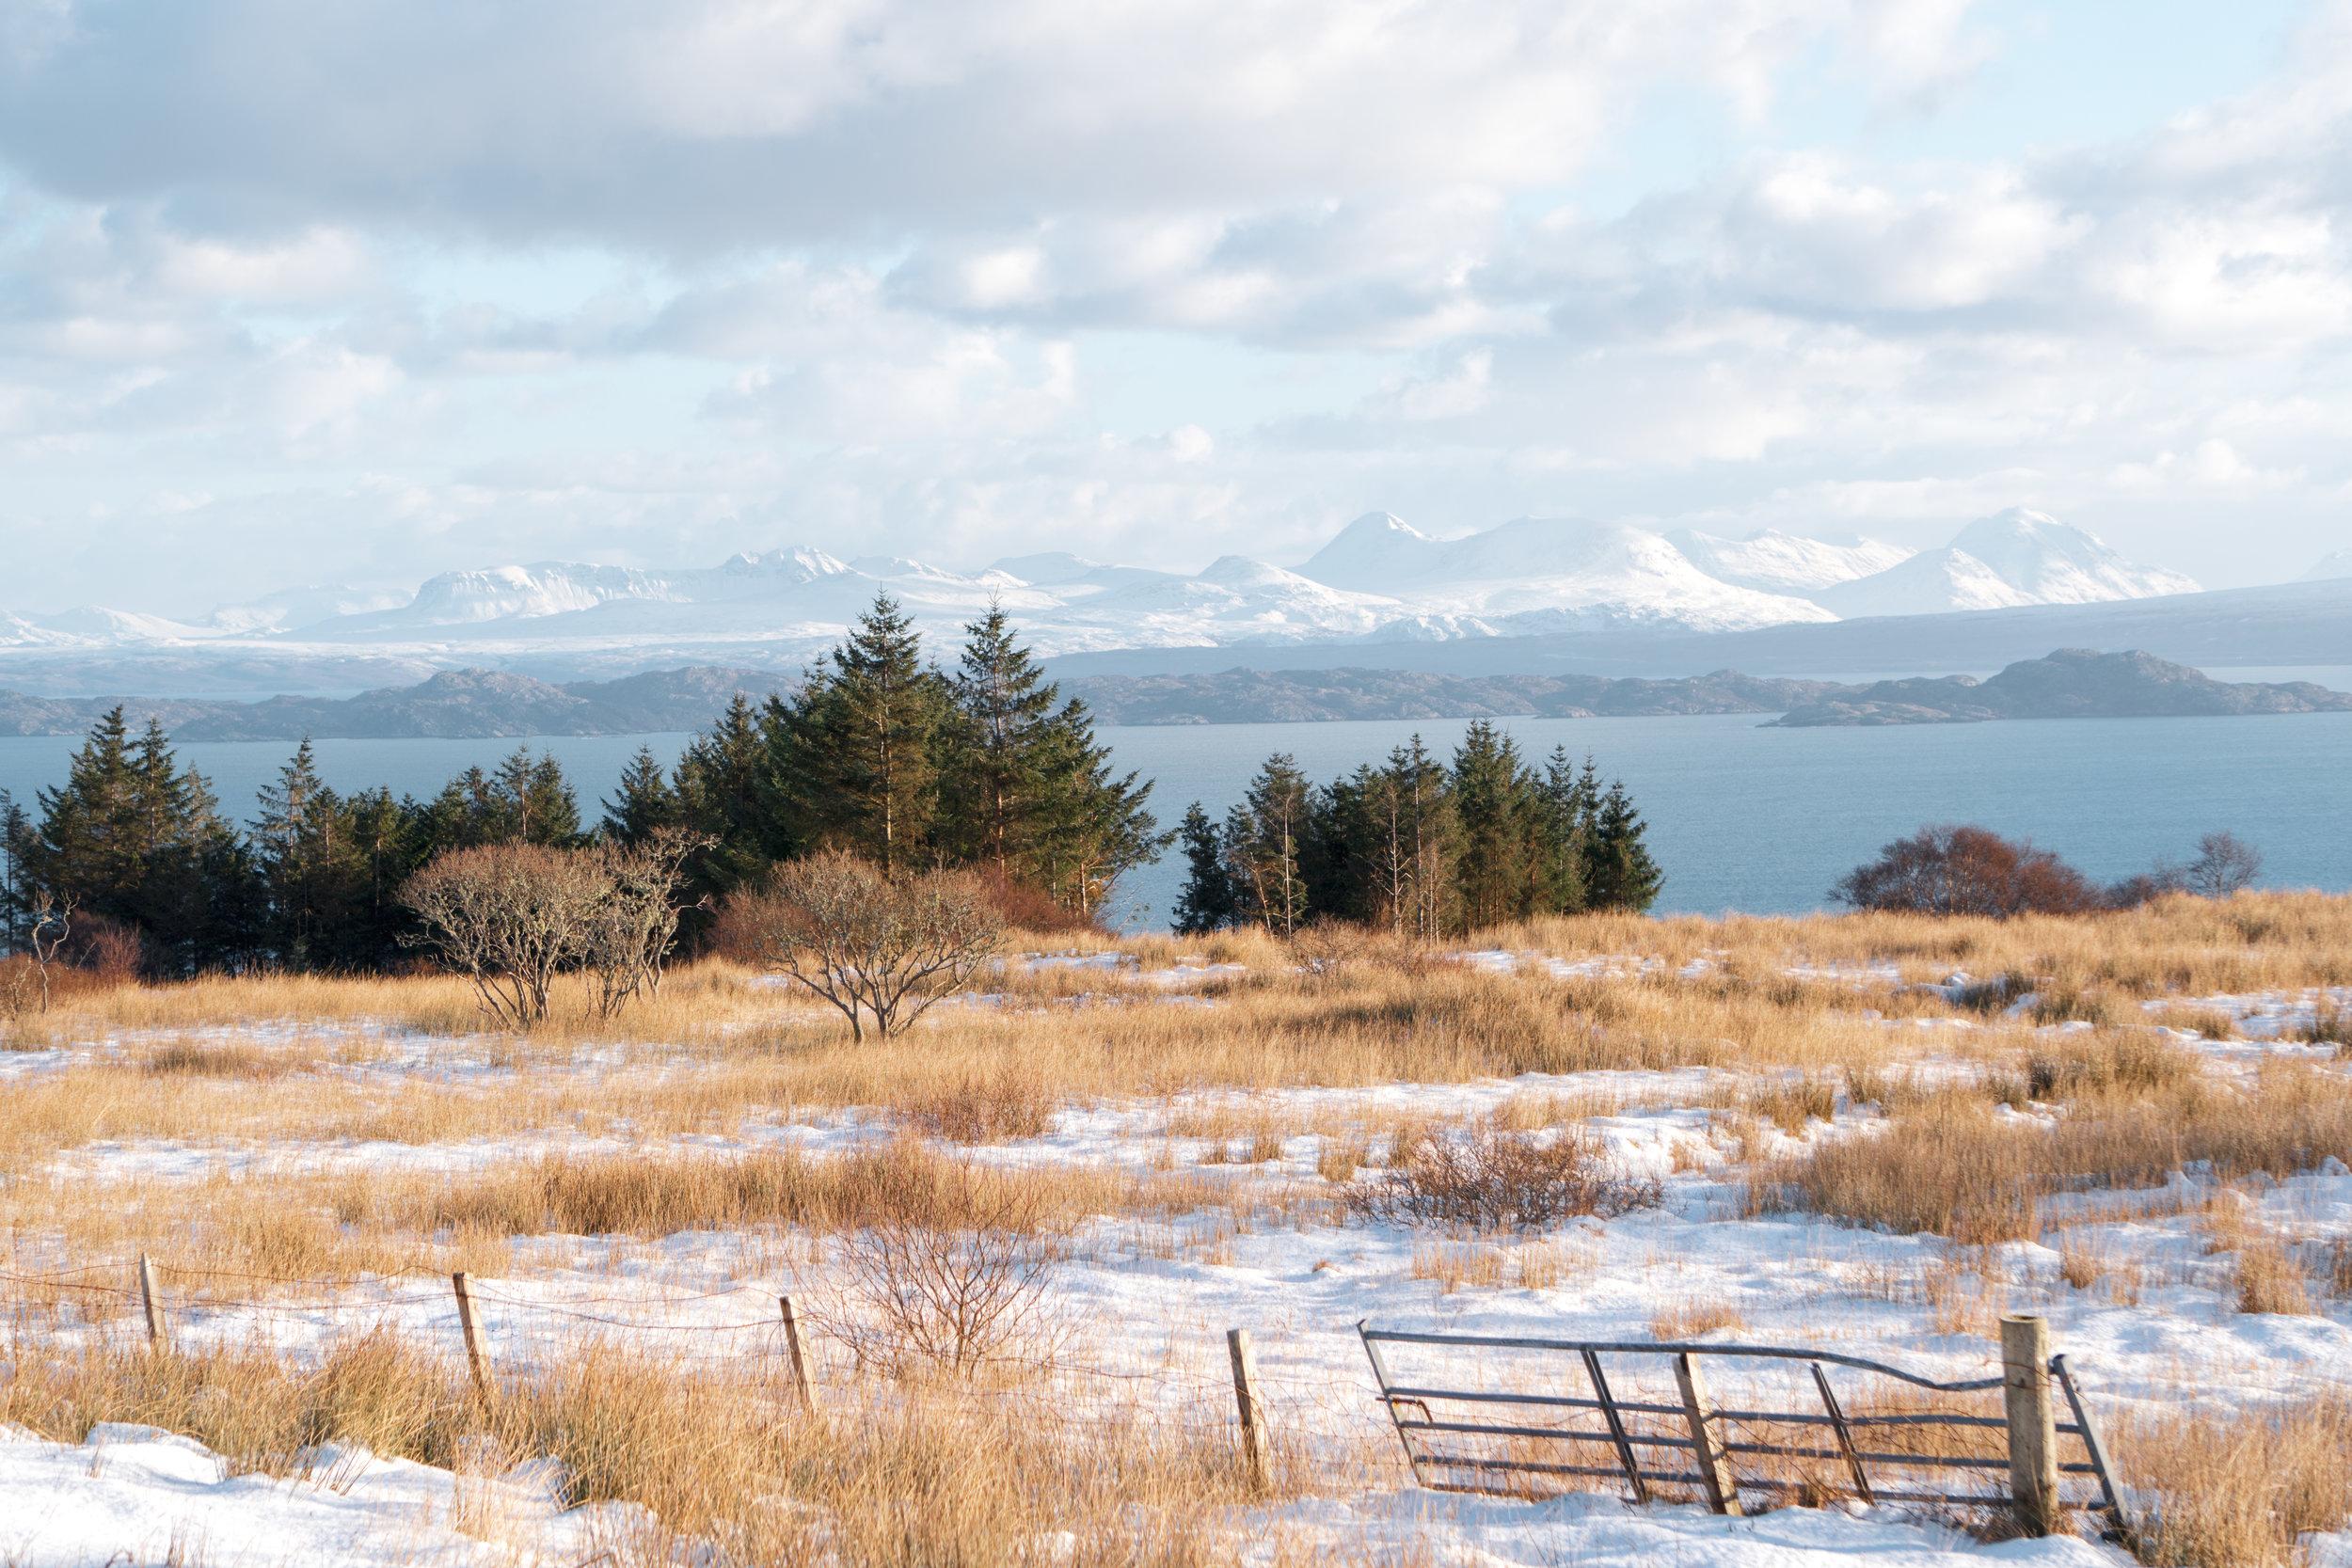 Isle-of-Skye-Winter-2019-Trotternish (11).jpg